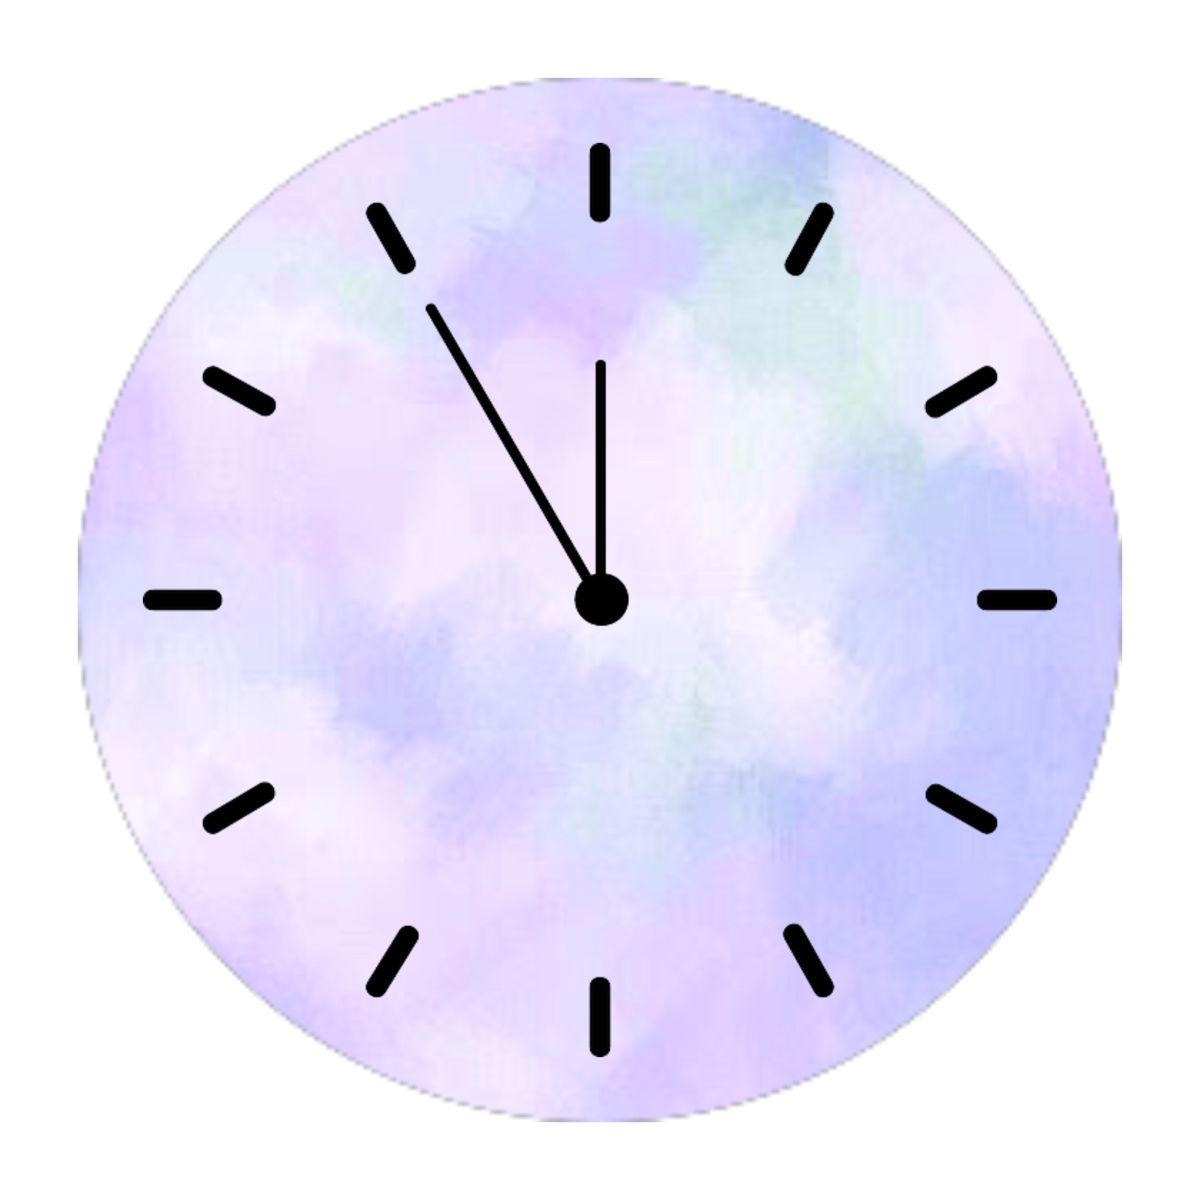 Clock Icon In 2020 Clock Icon Iphone App Design Purple Wallpaper Iphone